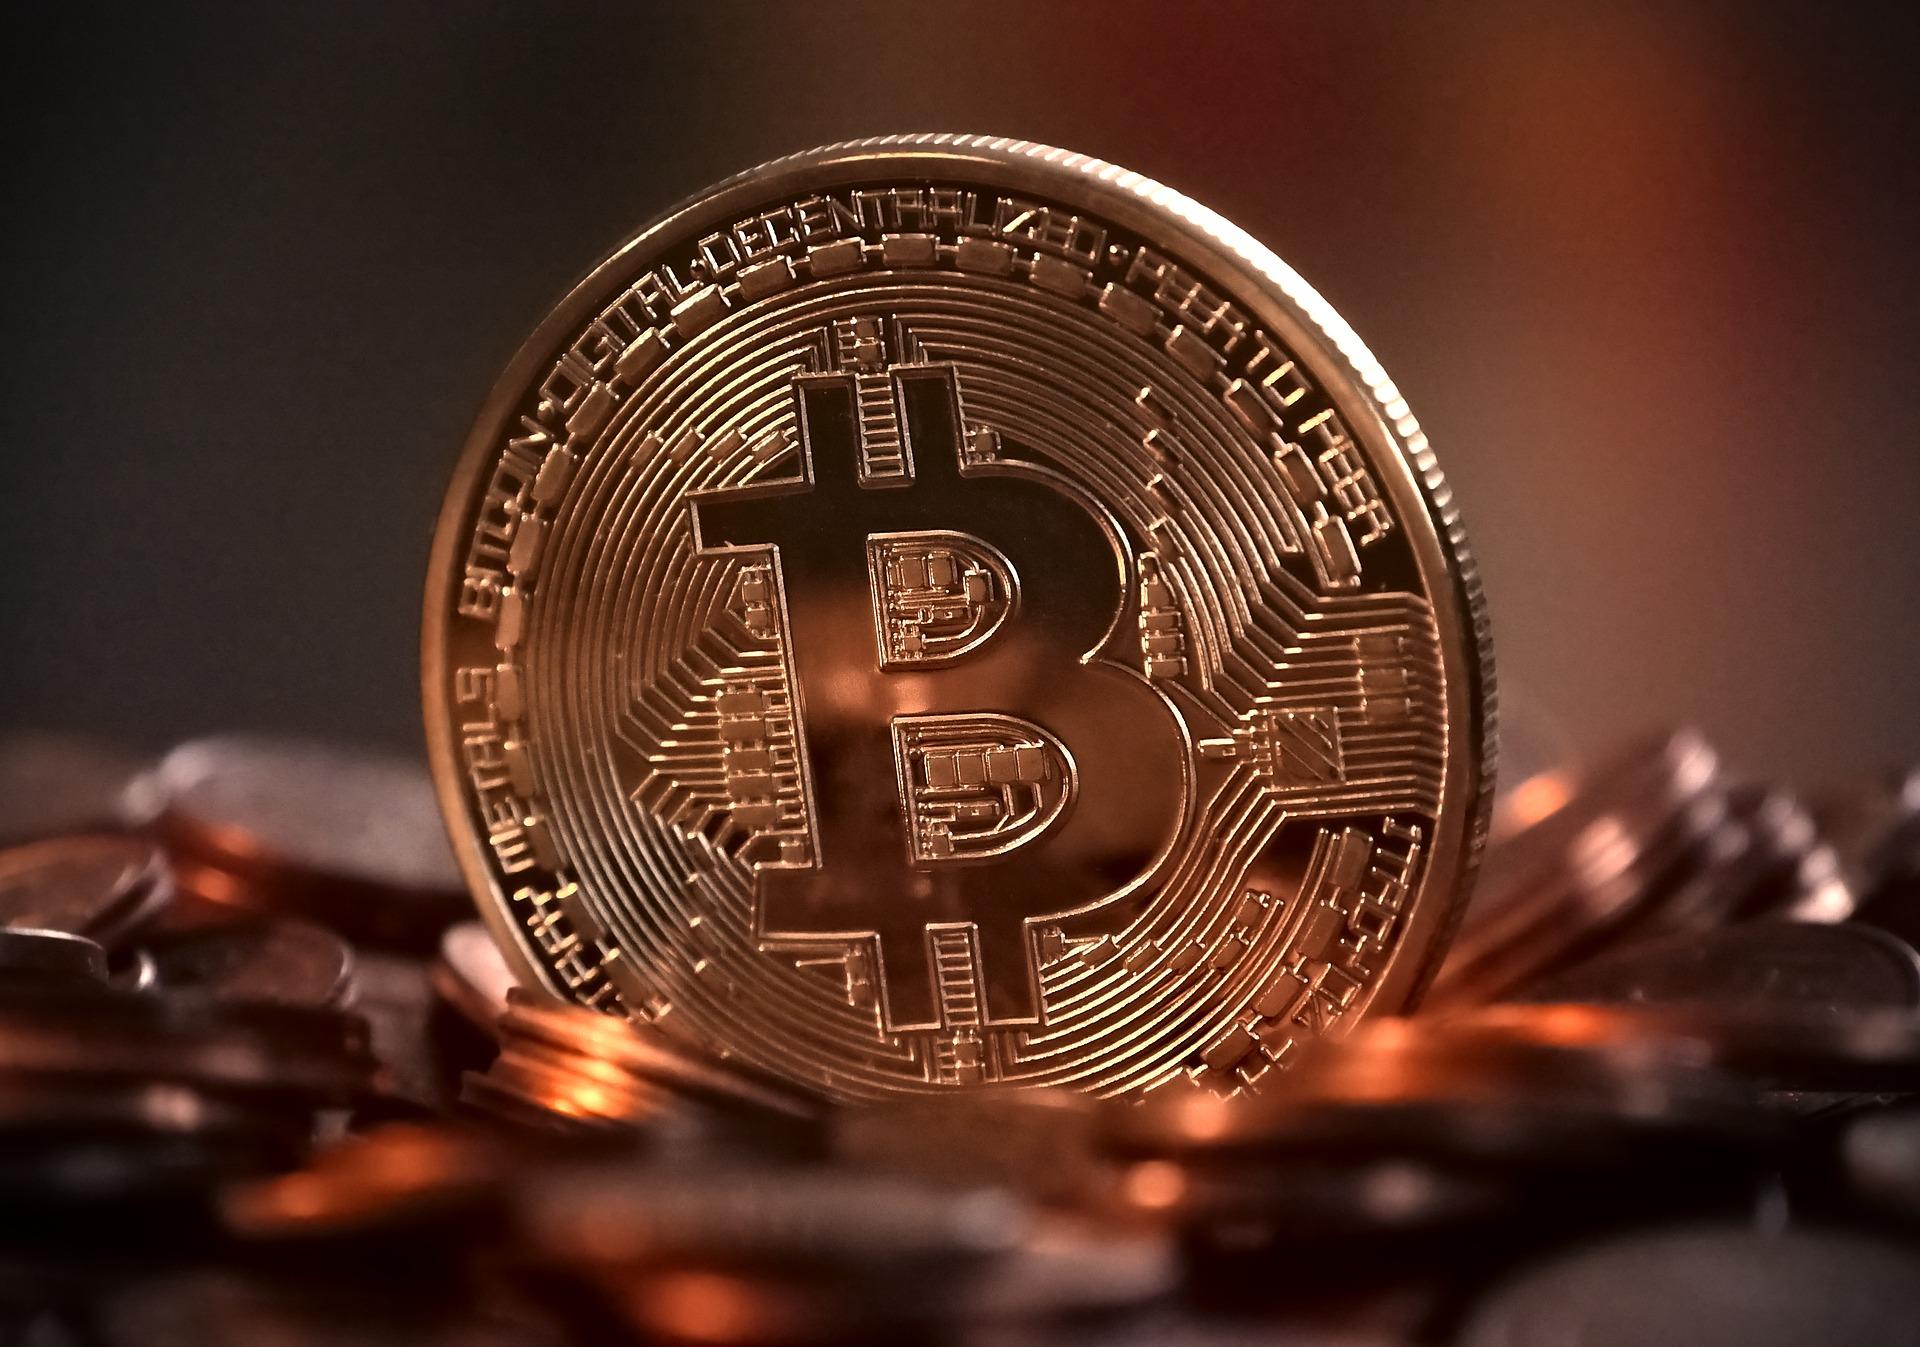 Where to buy Bitcoin? 3 ways to buy Bitcoin globally